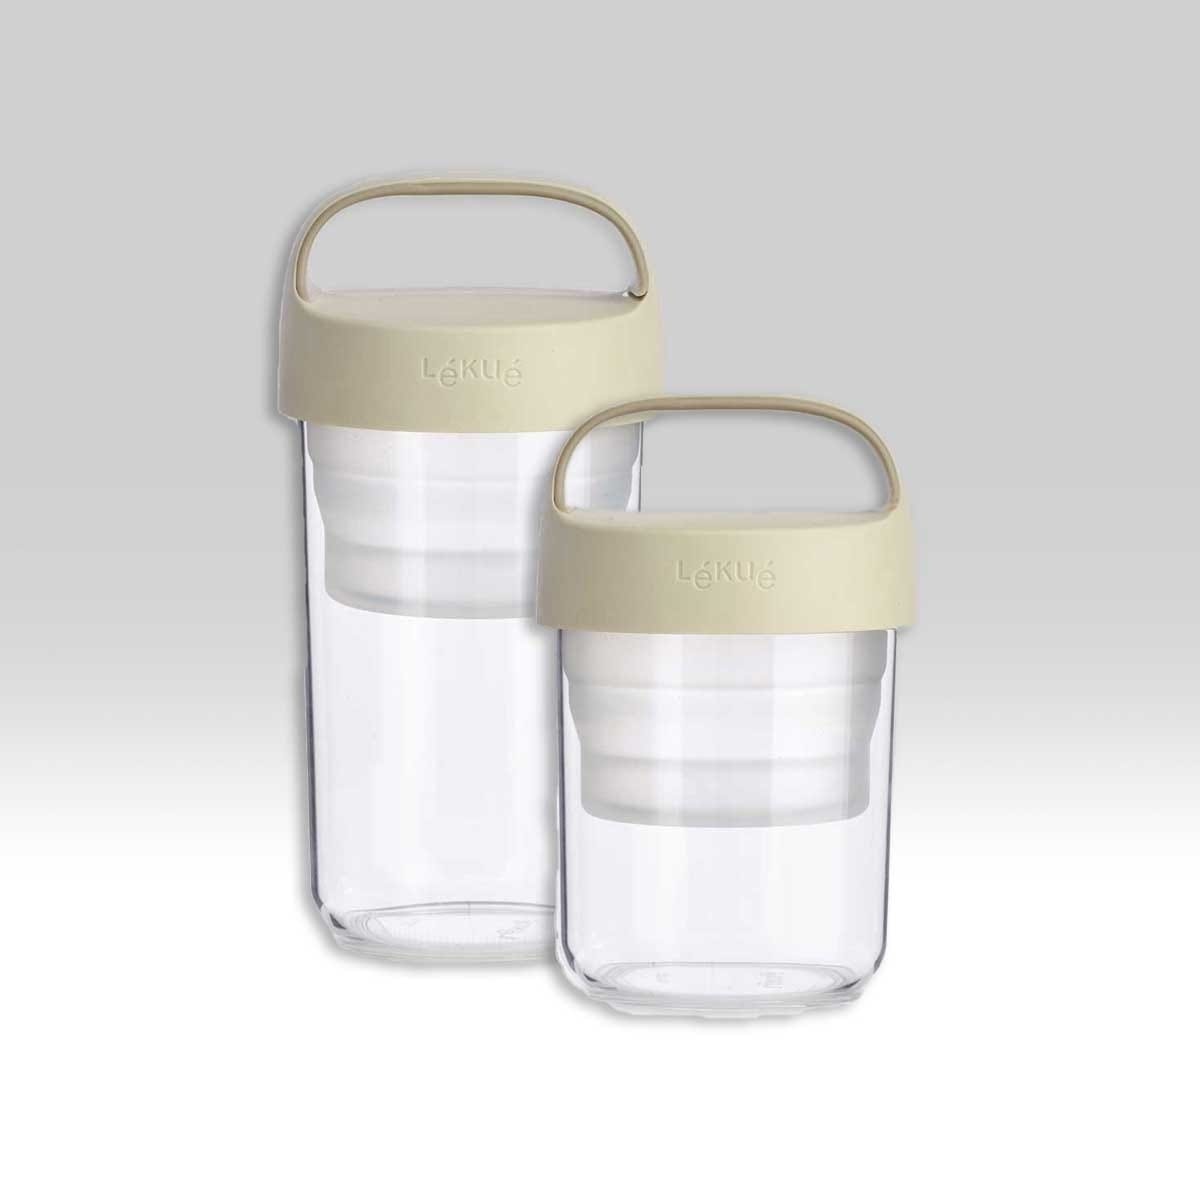 Lékué Transportdose Set (400ml + 600ml) aus Plastik mit beigem Deckel